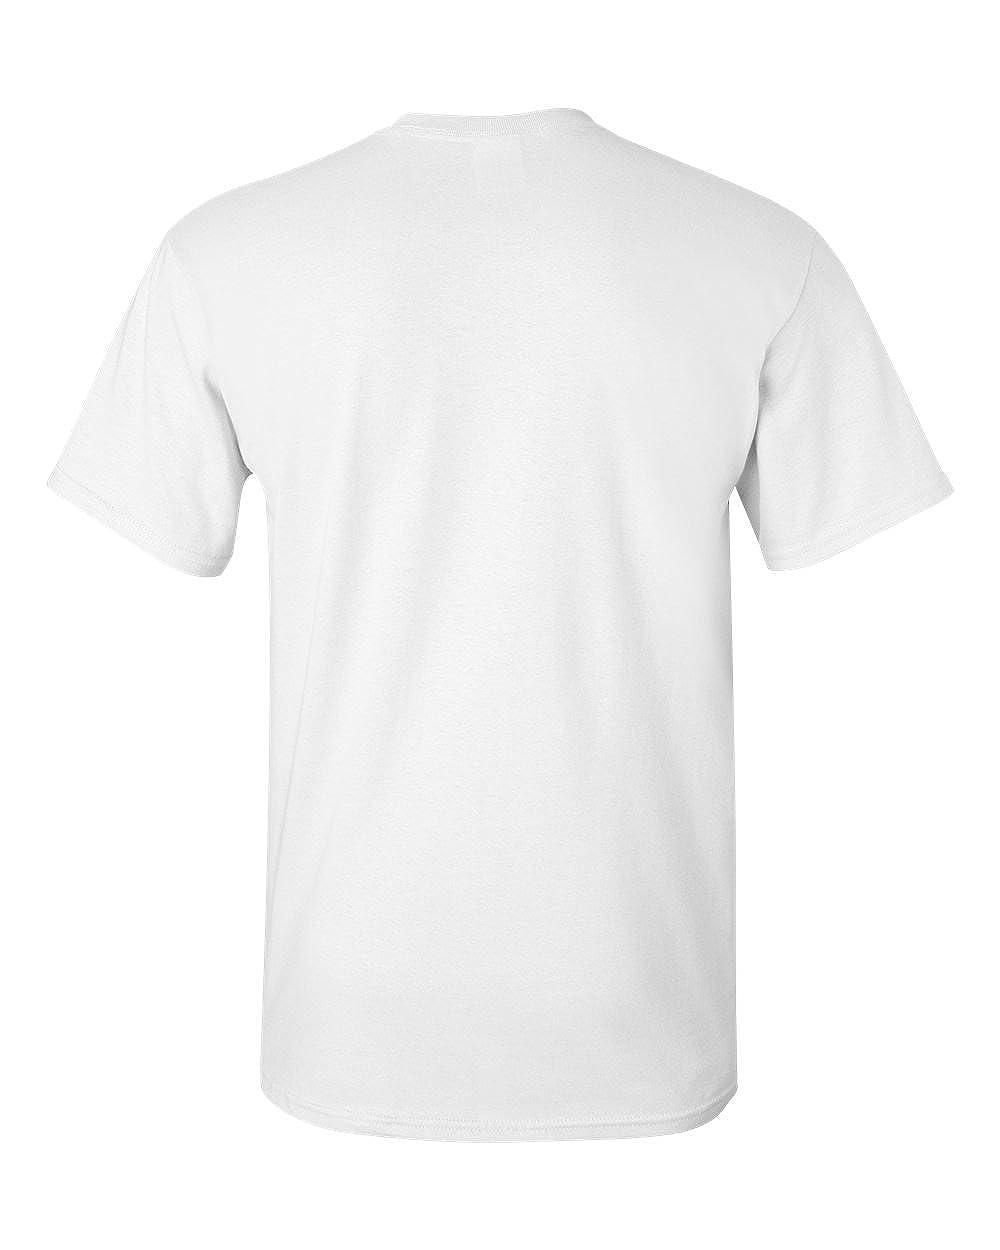 G500 T-Shirt - White,XXX-Large Gildan Heavy Cotton 5.3 Oz